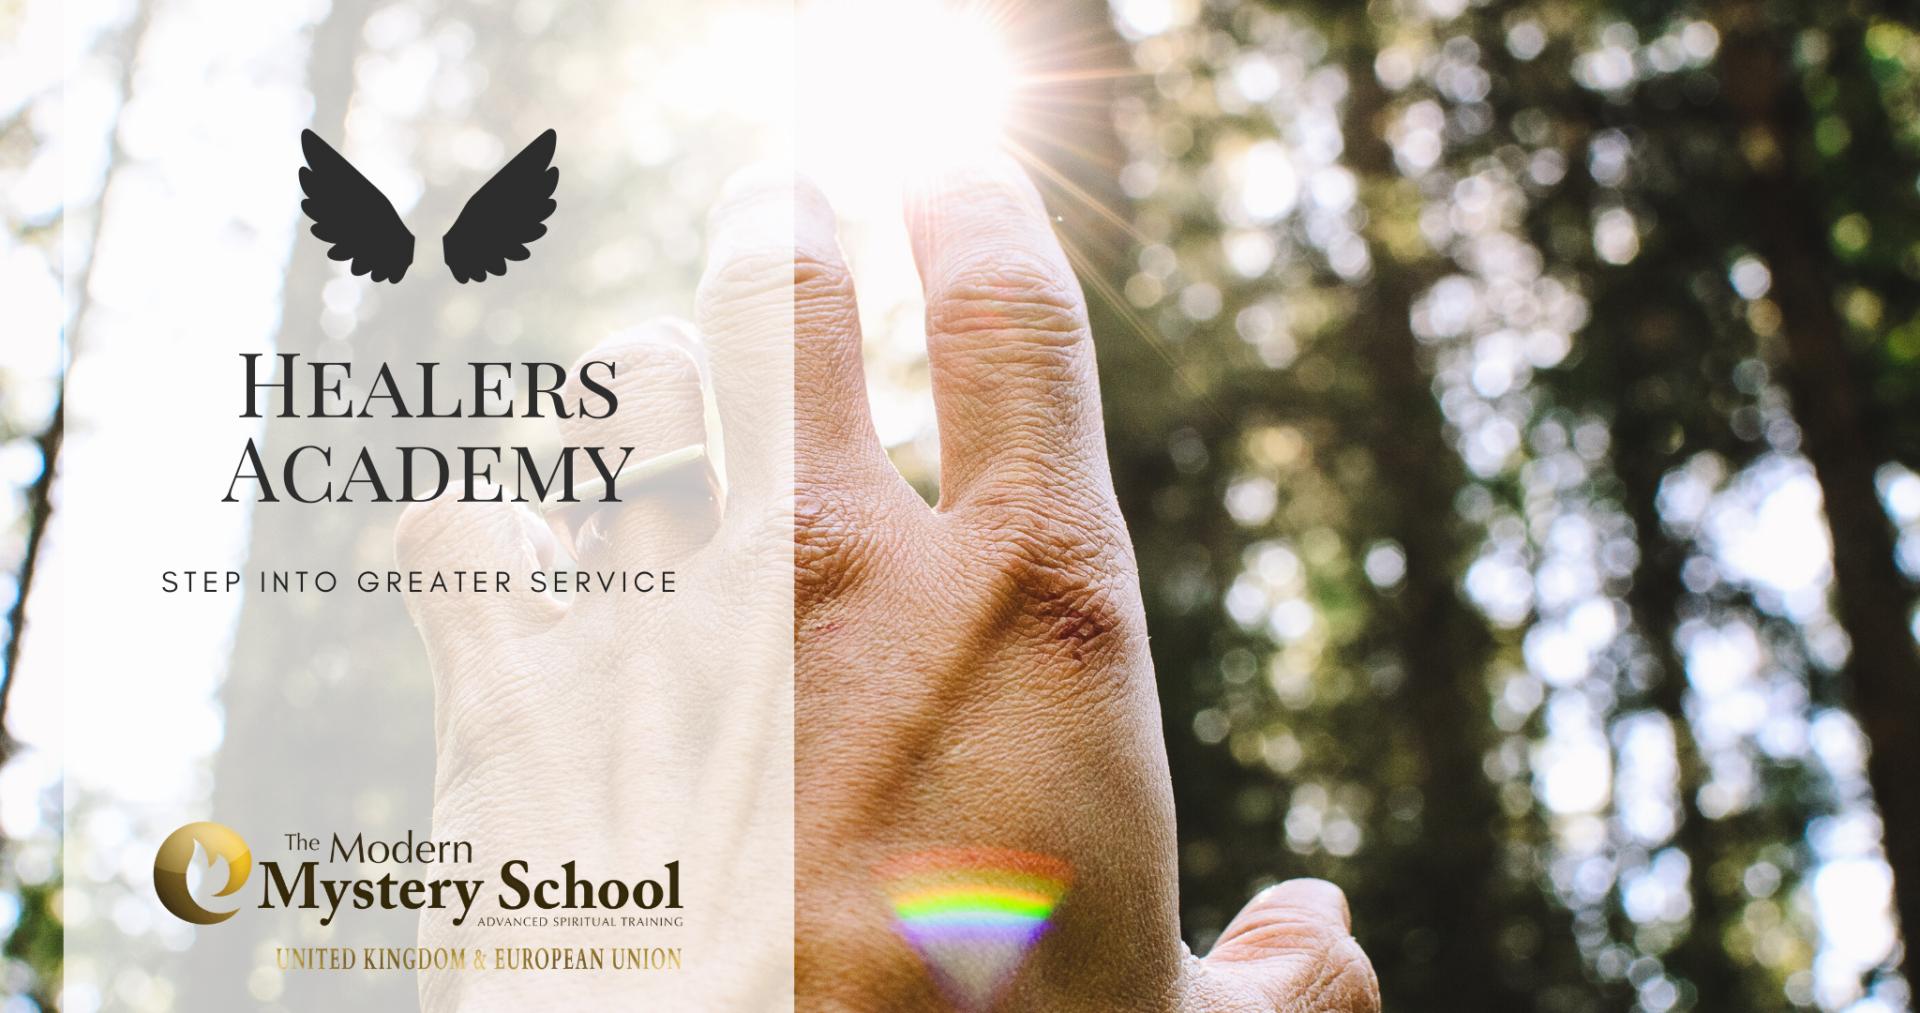 Healers Academy